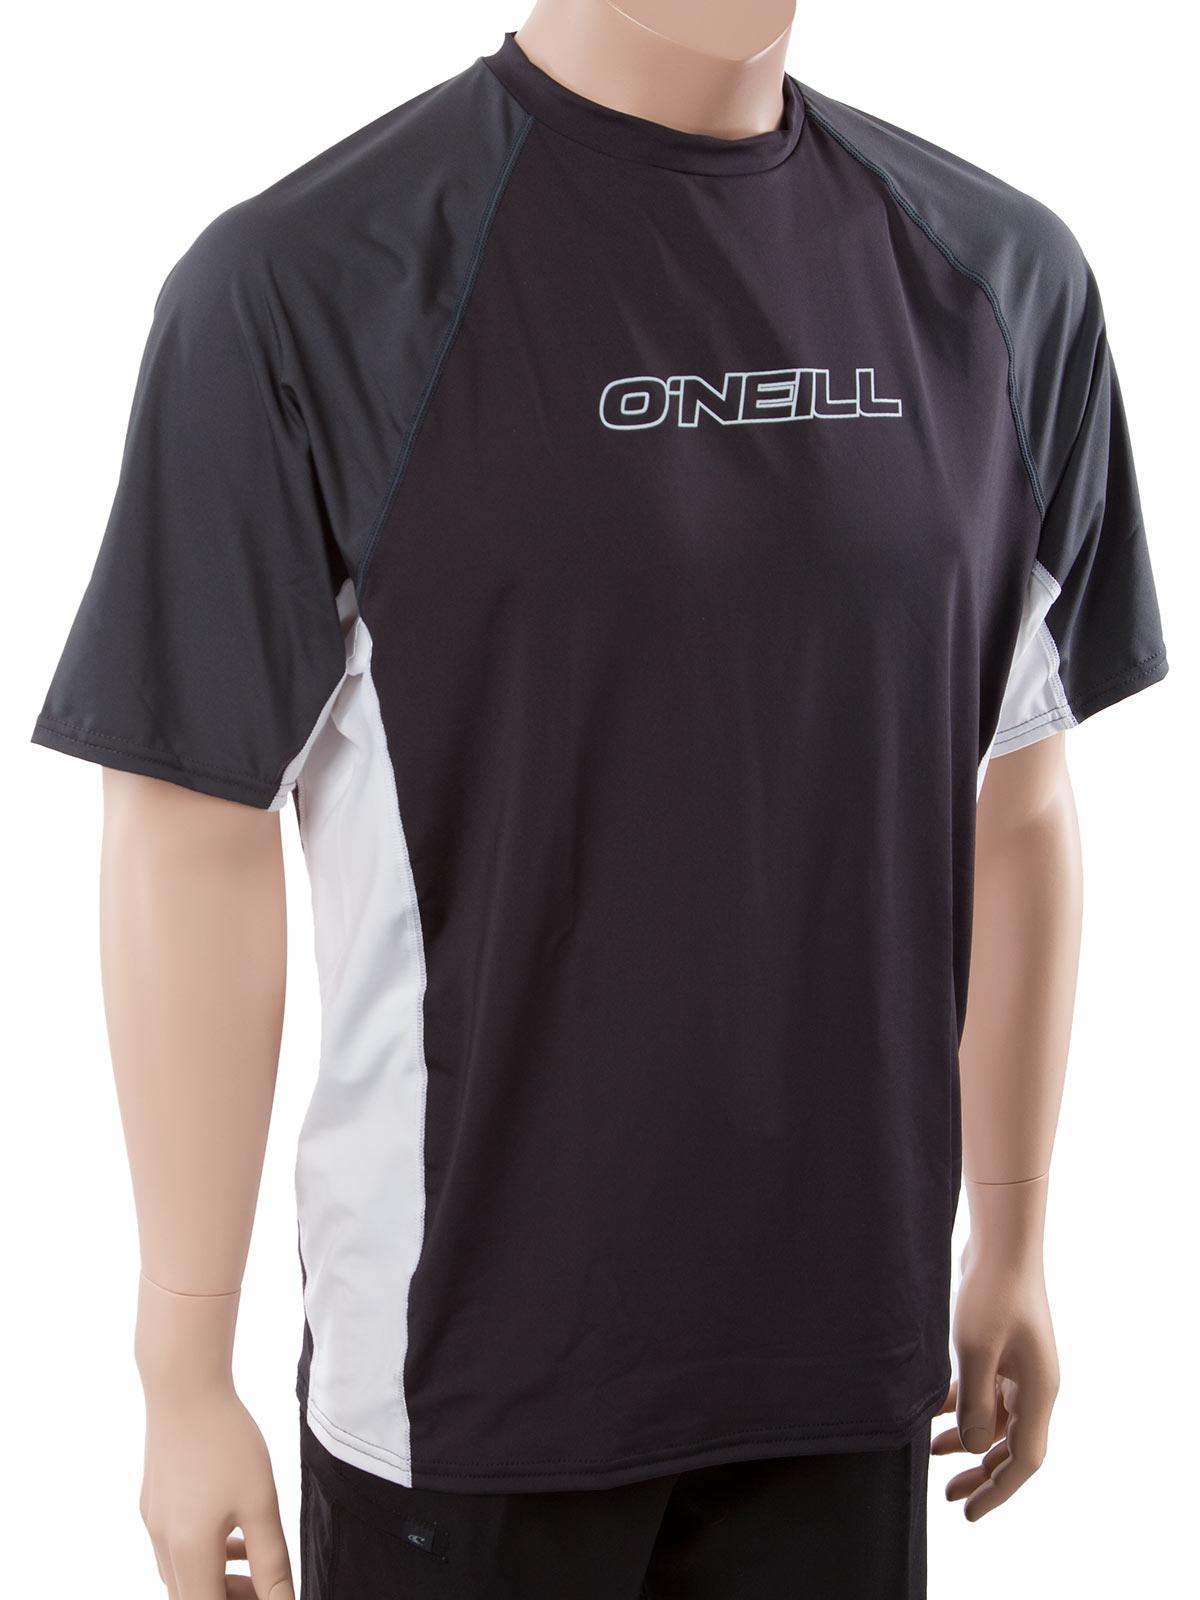 O'Neill Men 24/7 Sun Tee: Looser Fit Rashguard Swim Shirt Regular & Big/Tall Sizes